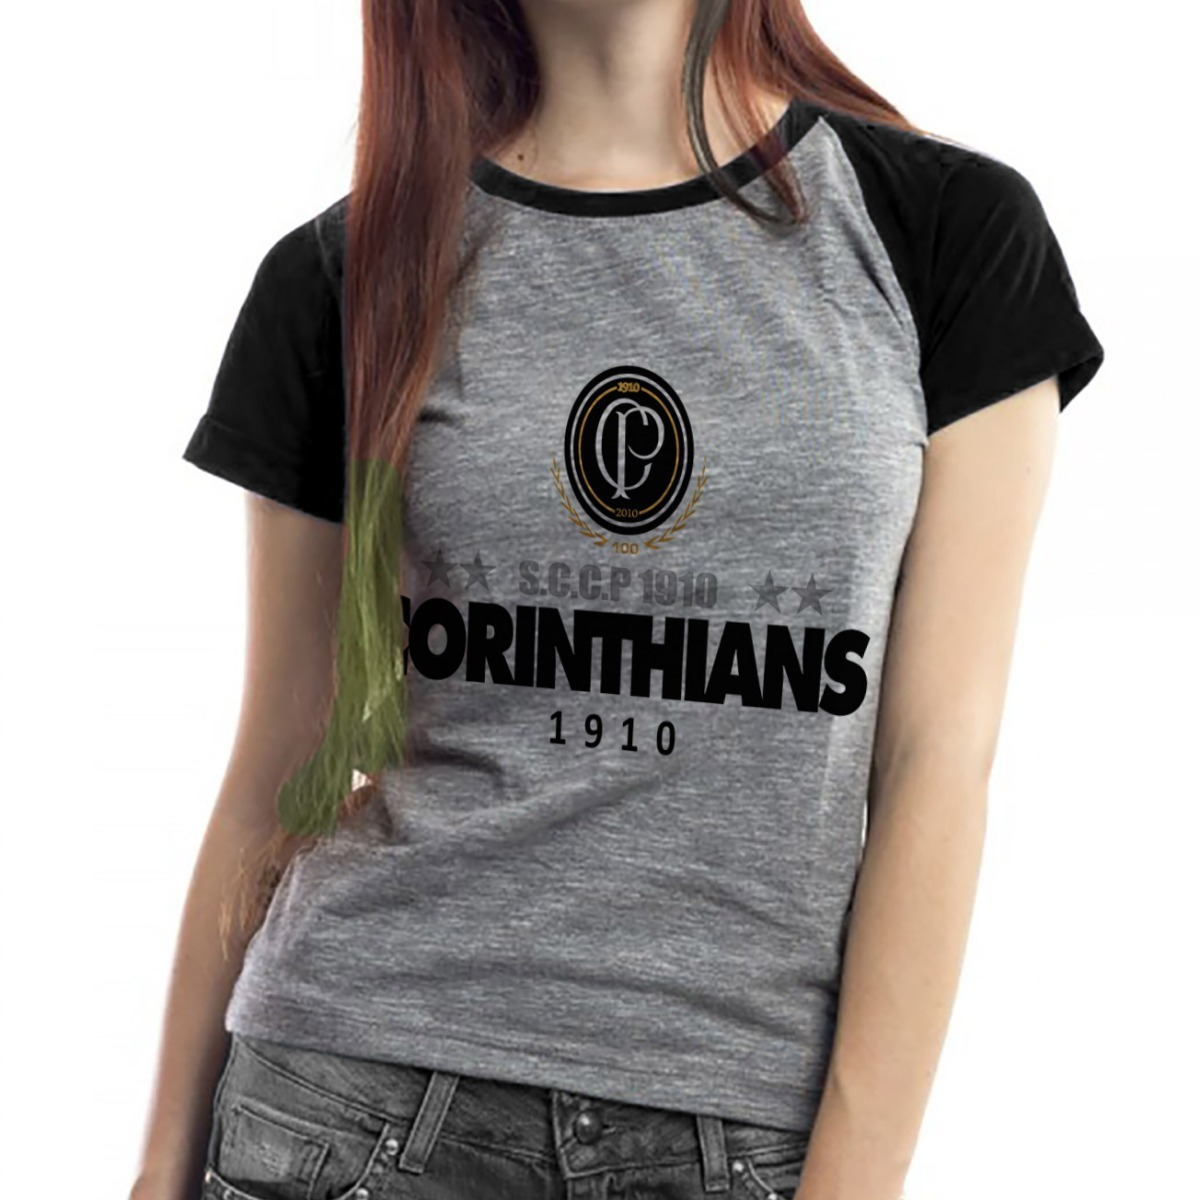 f9ba26292c camiseta corinthians feminina baby look raglã timão 2019. Carregando zoom.